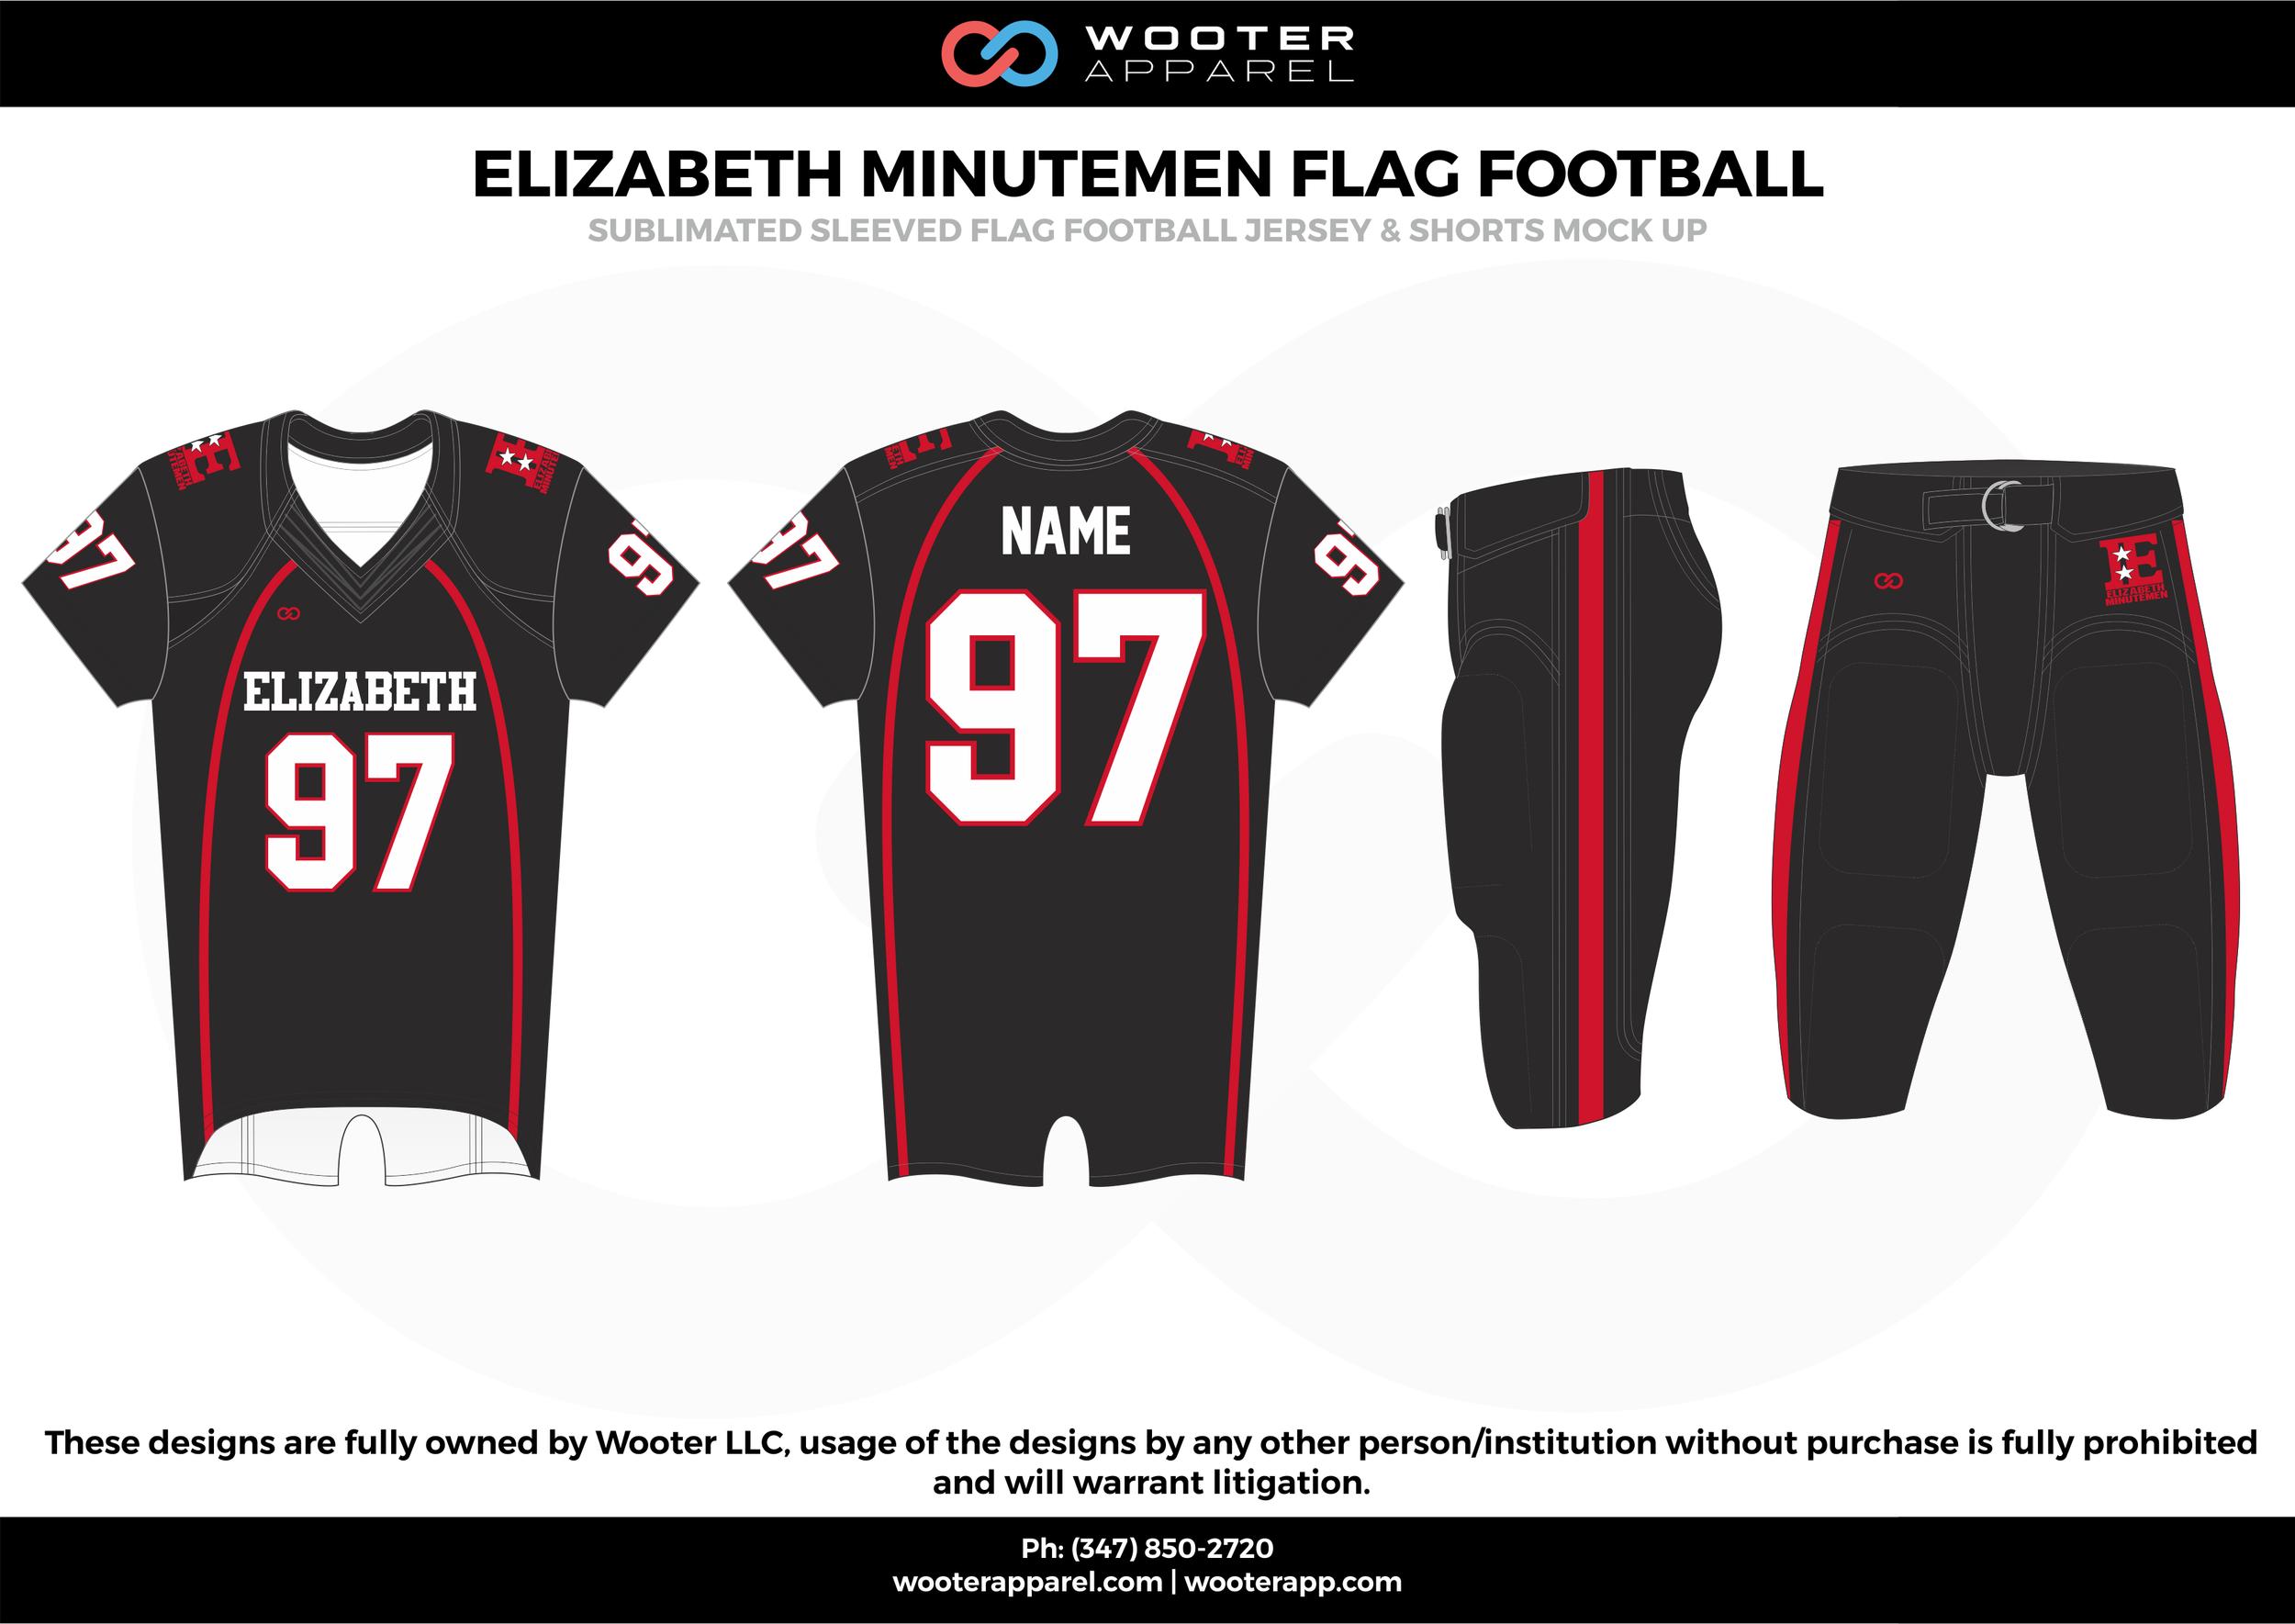 ELIZABETH MINUTEMEN FLAG FOOTBALL black red white flag football uniforms jerseys pants